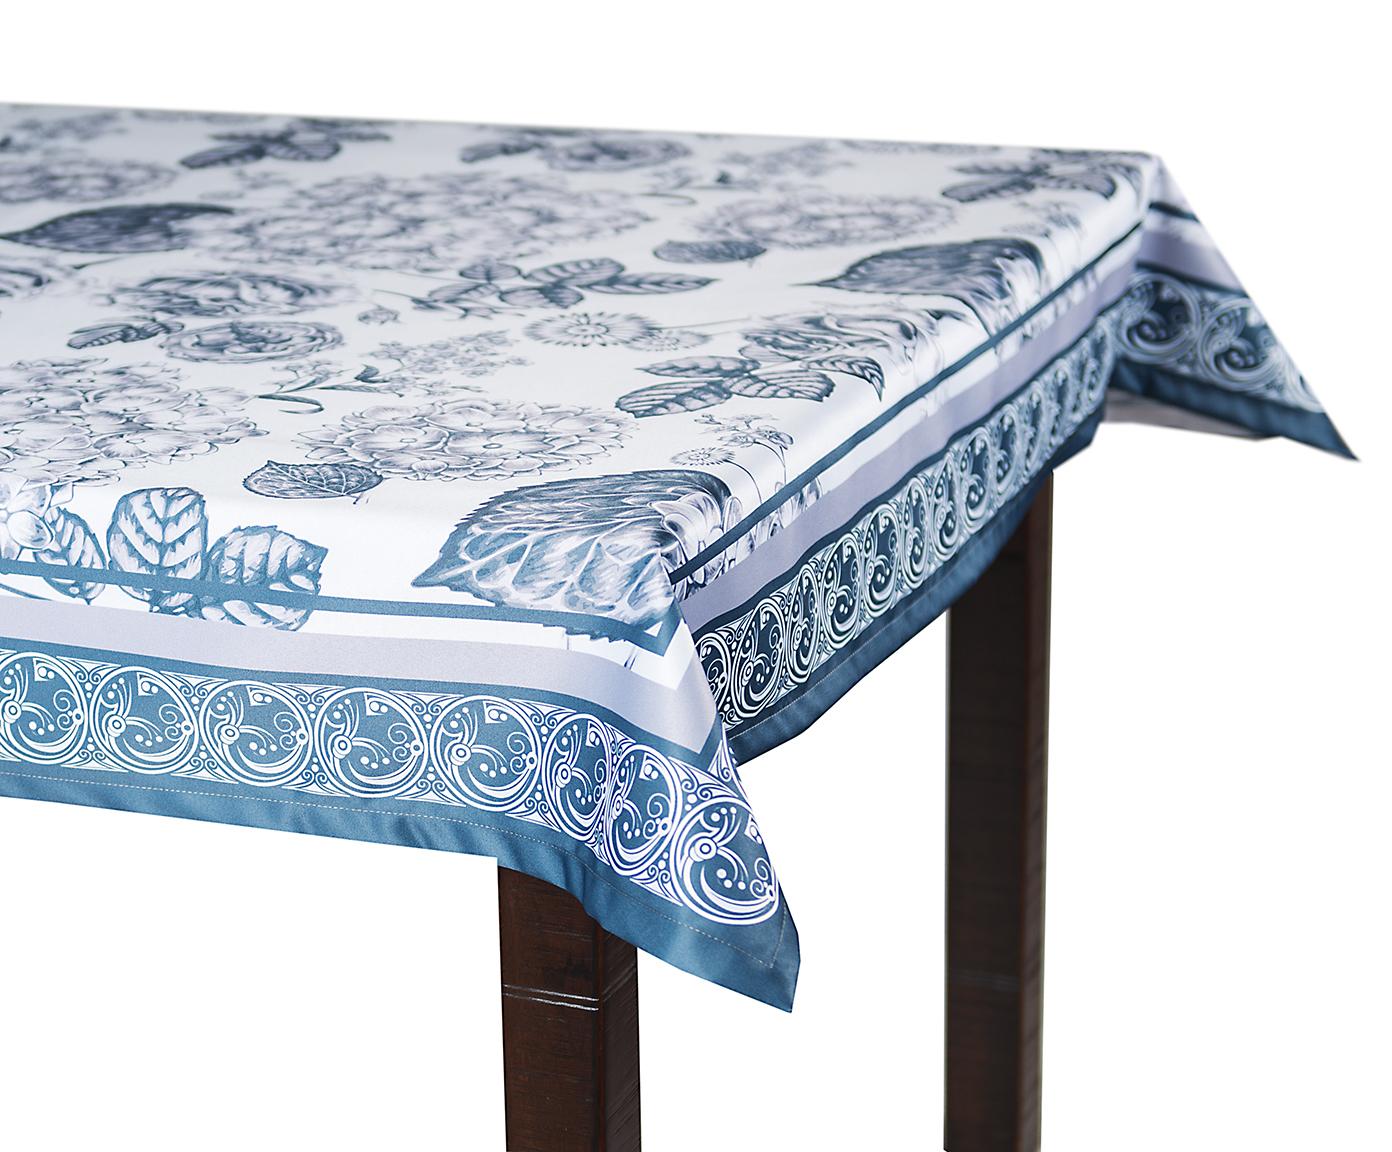 Кухня Скатерть 140x220 Blonder Home Sketchbook синяя skatert-140x220-blonder-home-sketchbook-sinyaya-ssha-rossiya.jpg